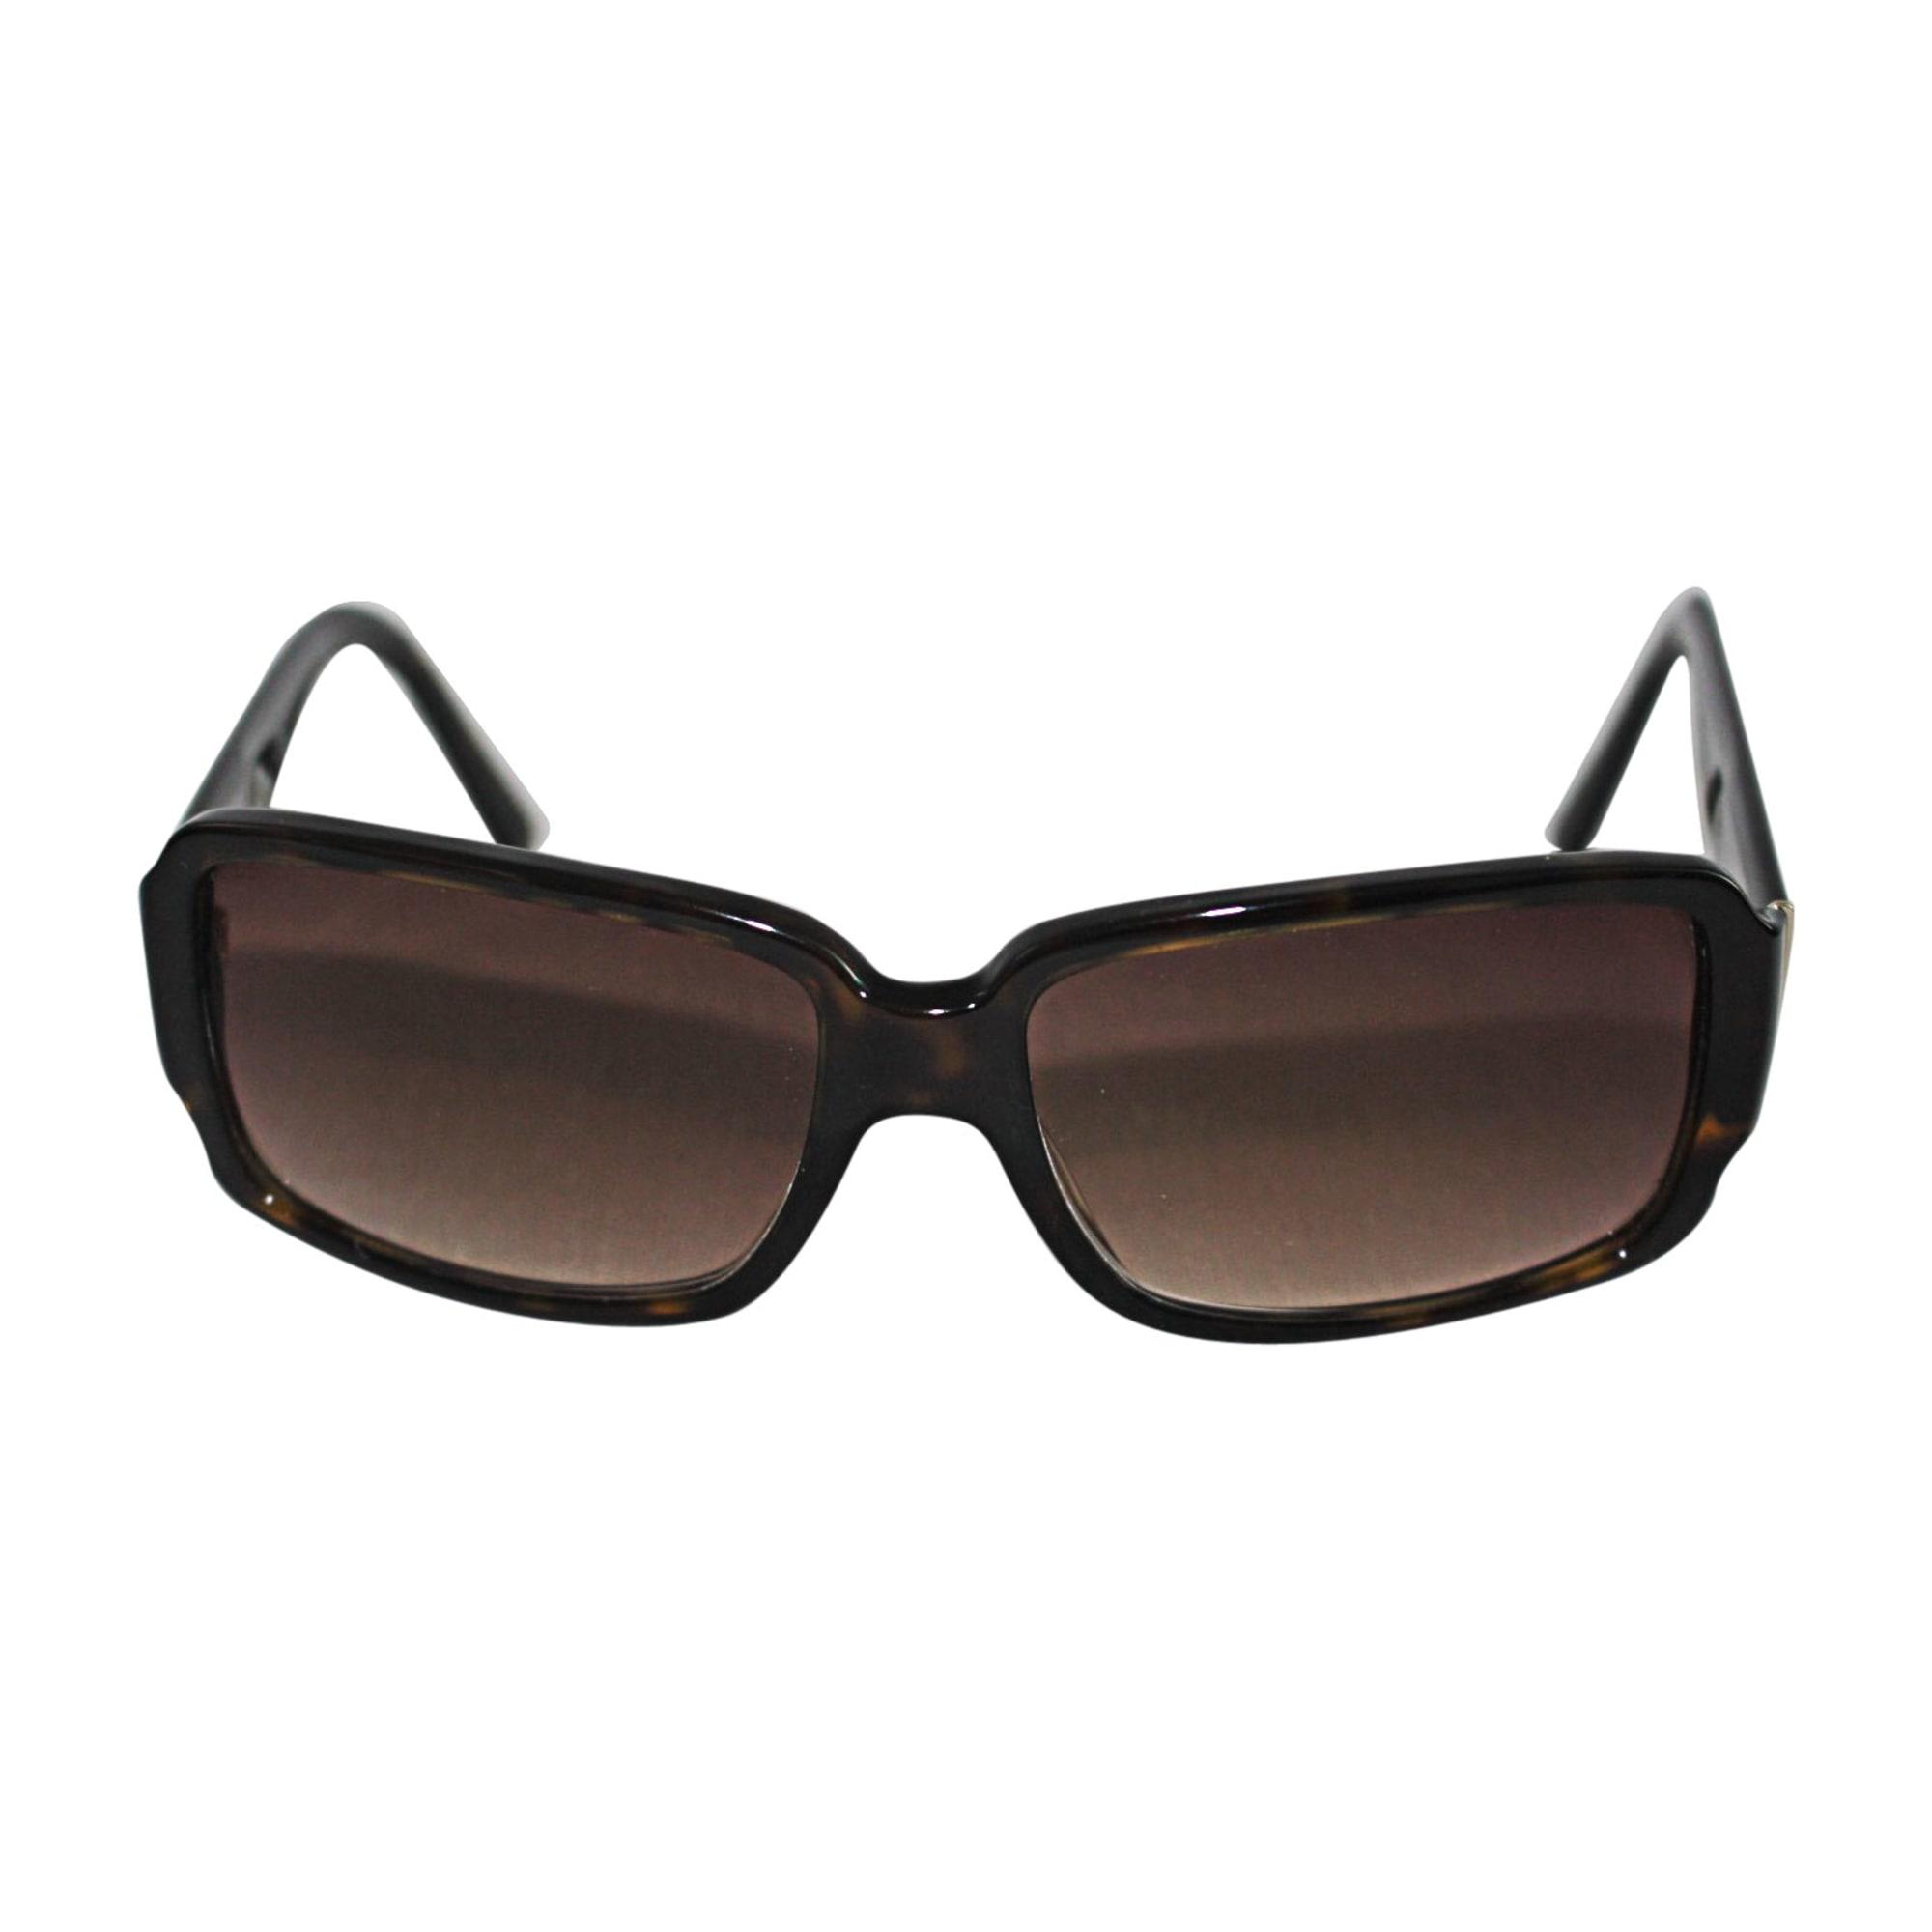 8d5e770a748f3 Monture de lunettes PRADA imprimés animaliers - 6646600